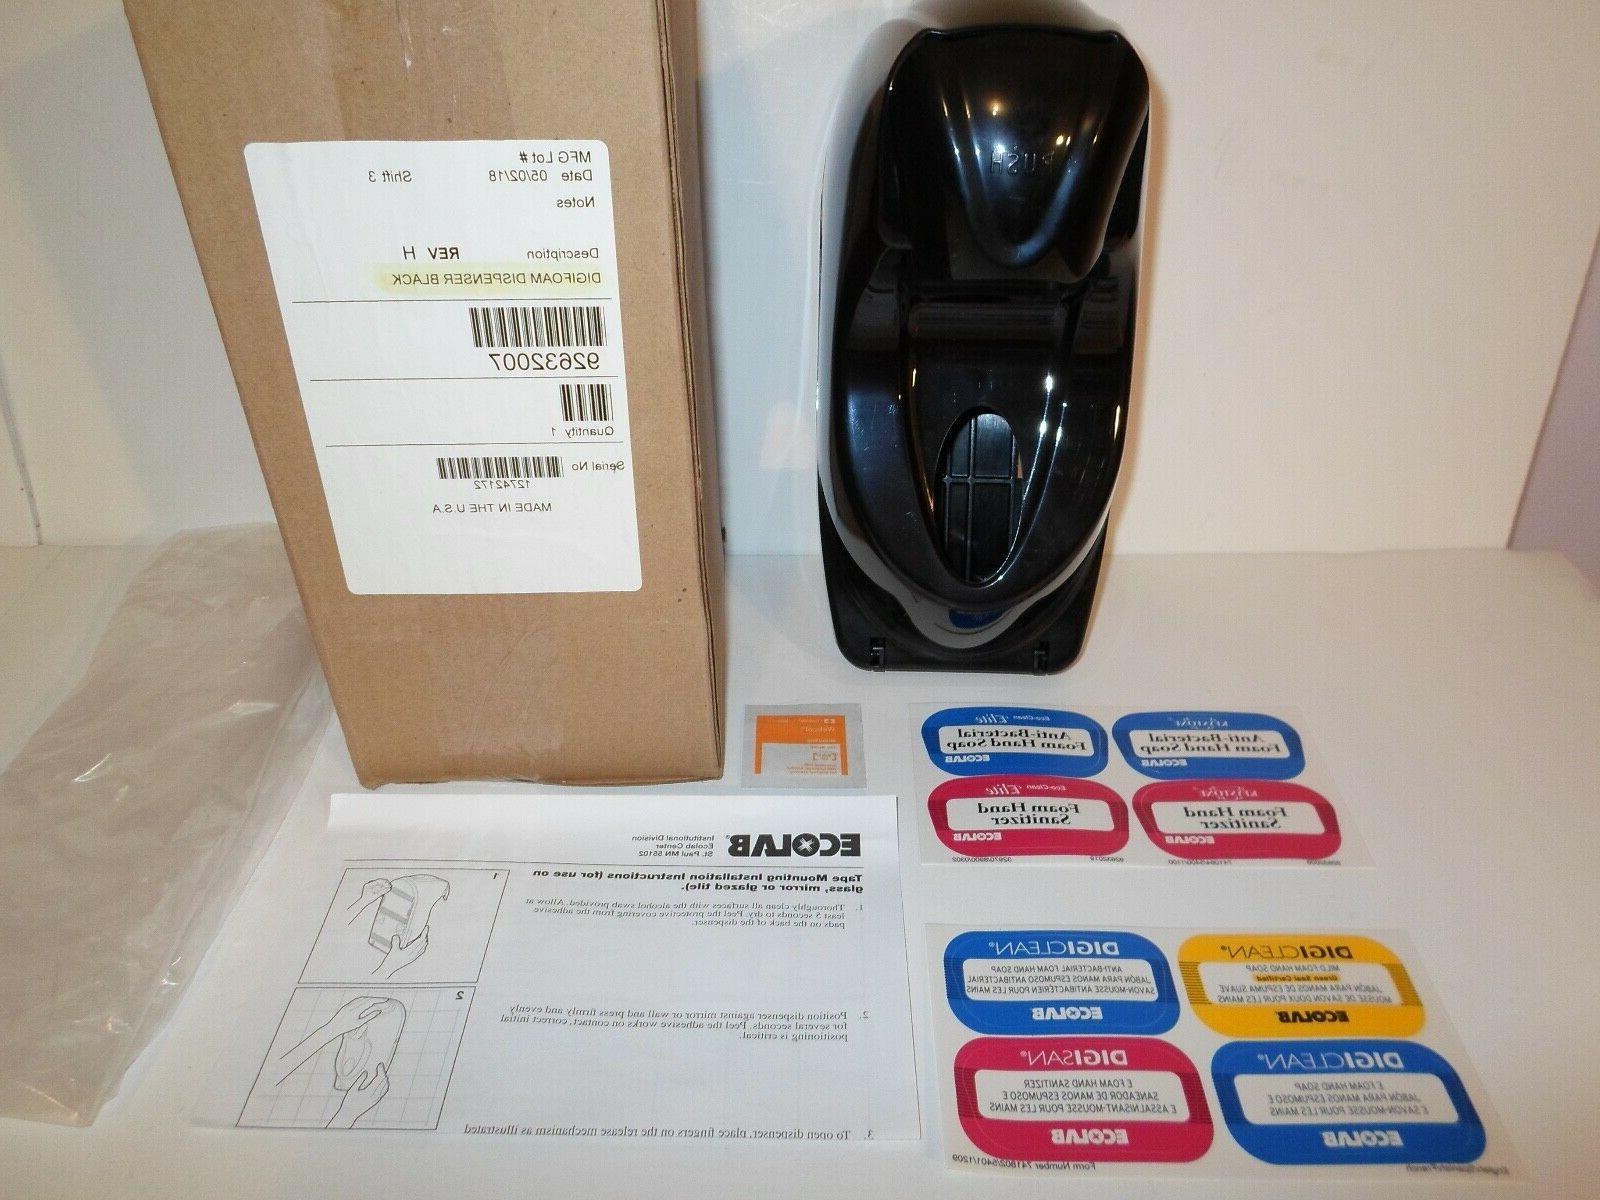 new digifoam hand sanitizer foam soap dispenser